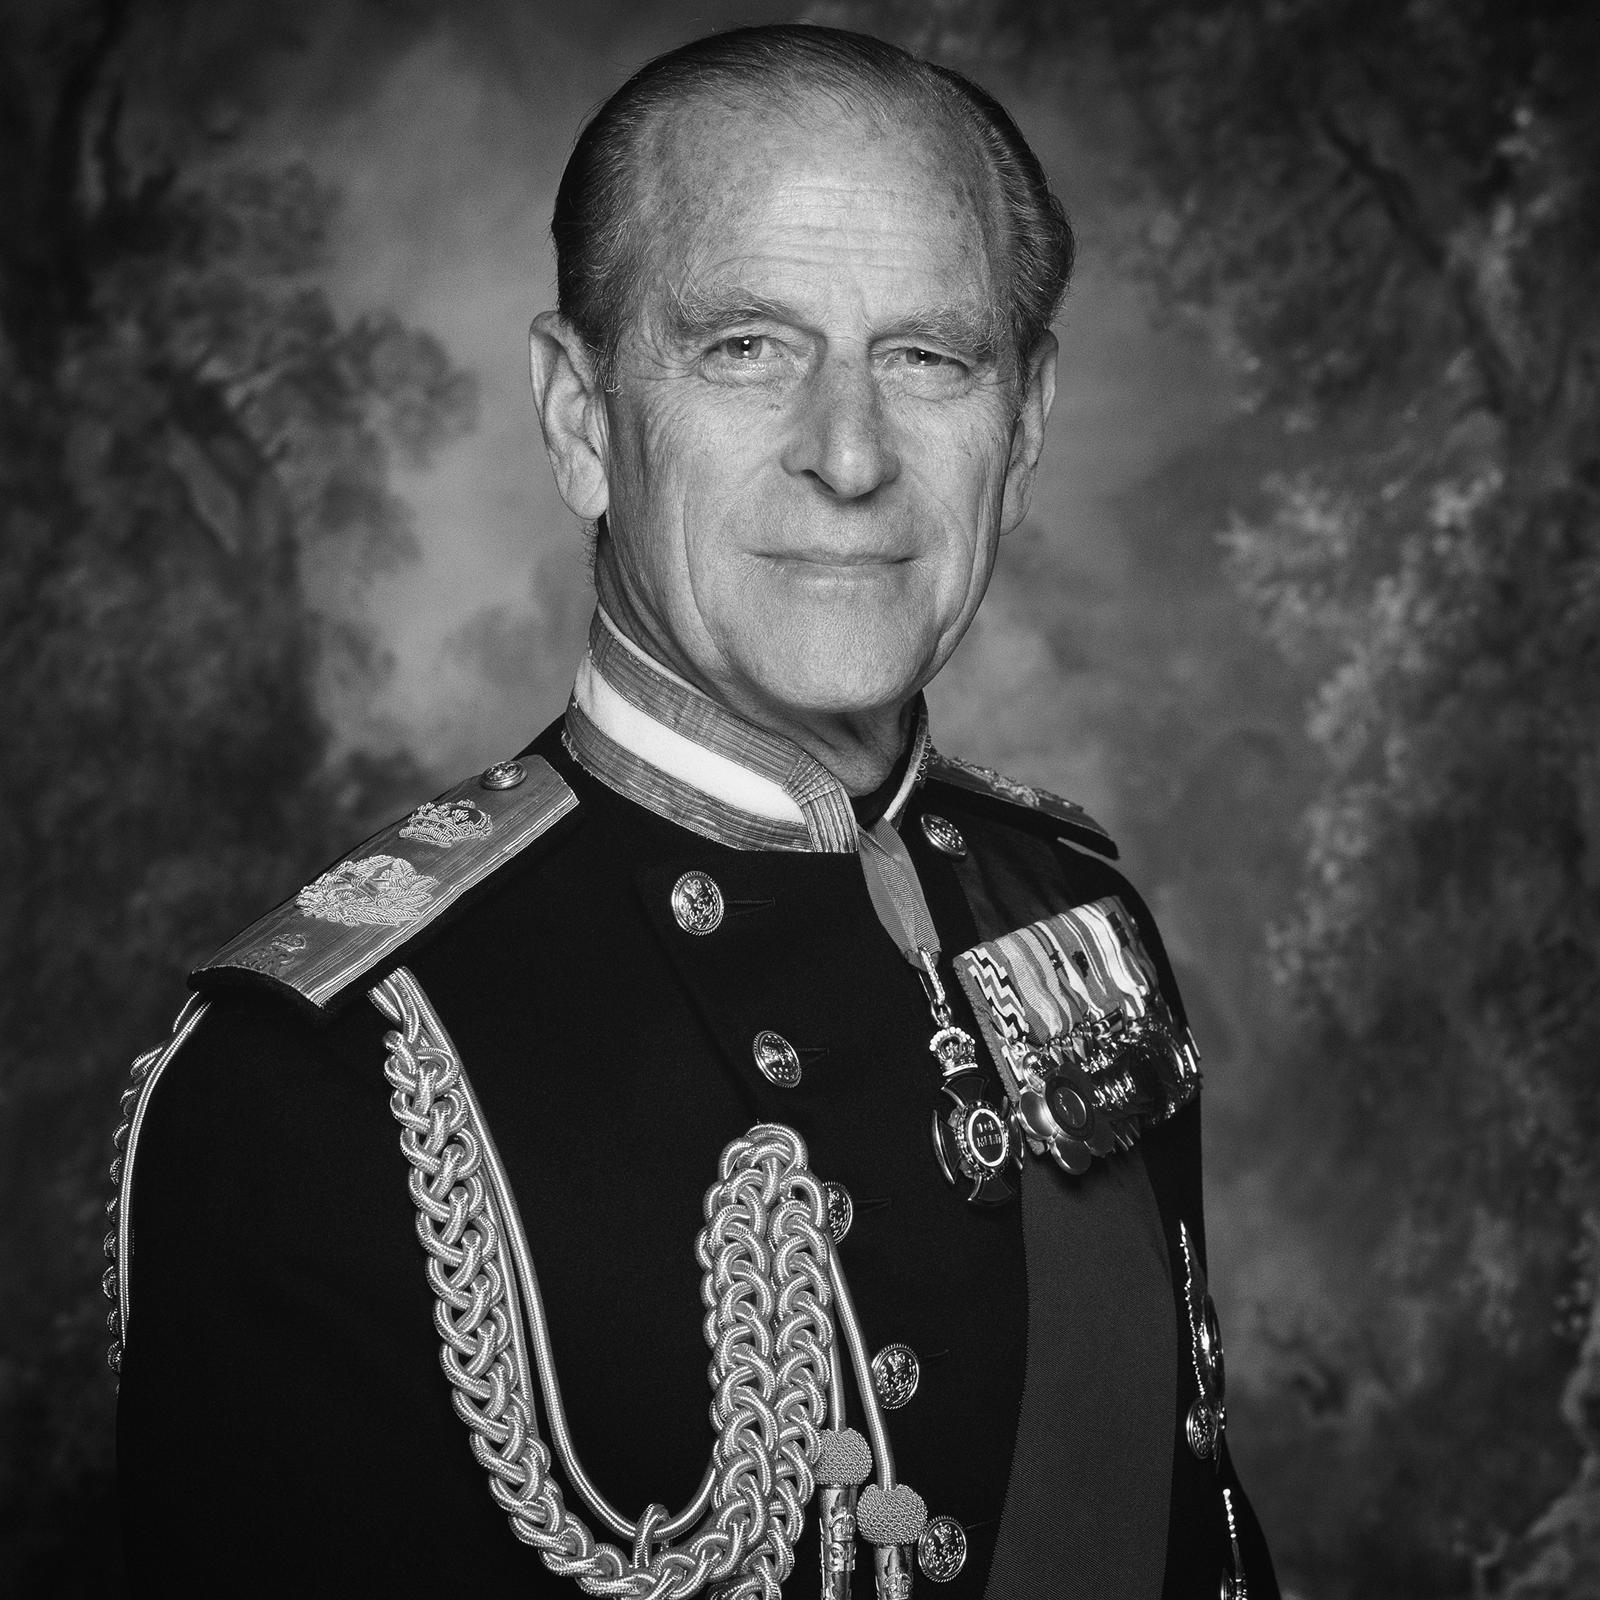 Duke of Edinburgh And Queen Elizabeth II's Husband, Prince Philip Is Dead